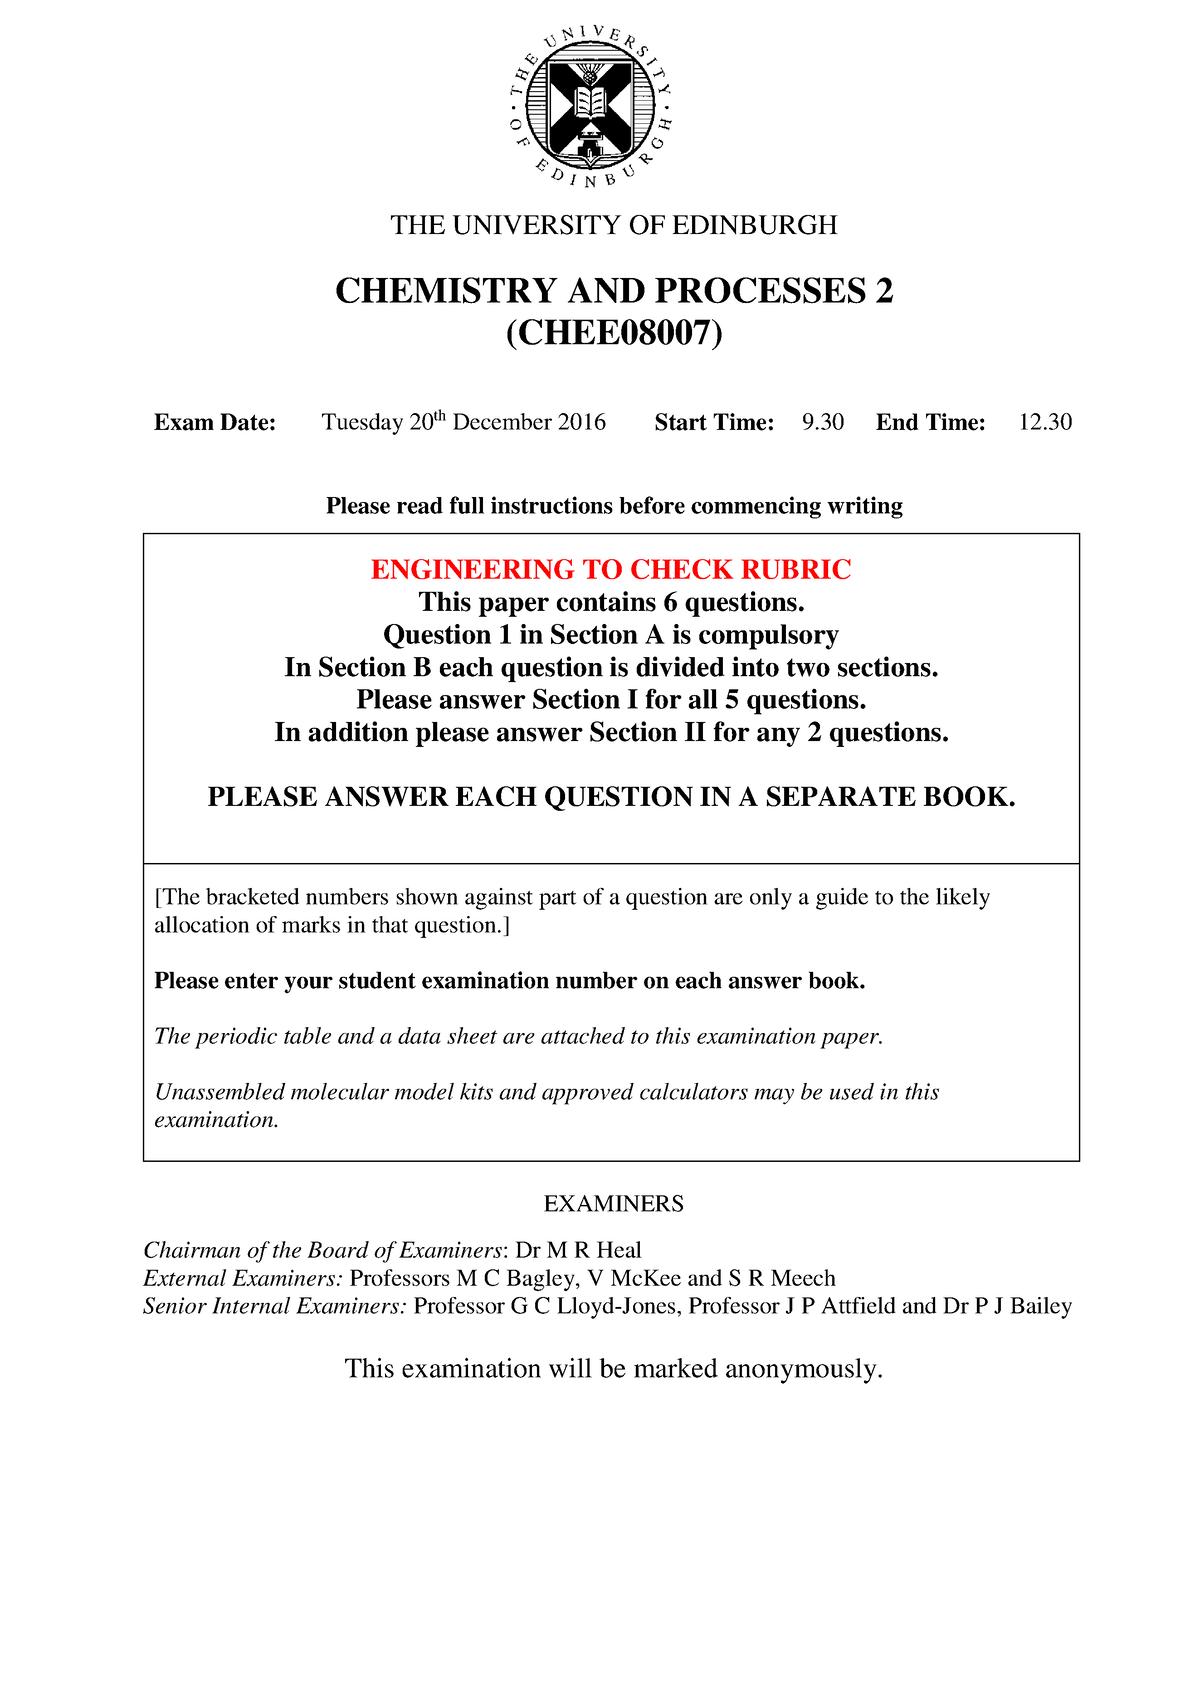 Exam 2016 - CHEE08007: Chemistry and Processes 2 - StuDocu